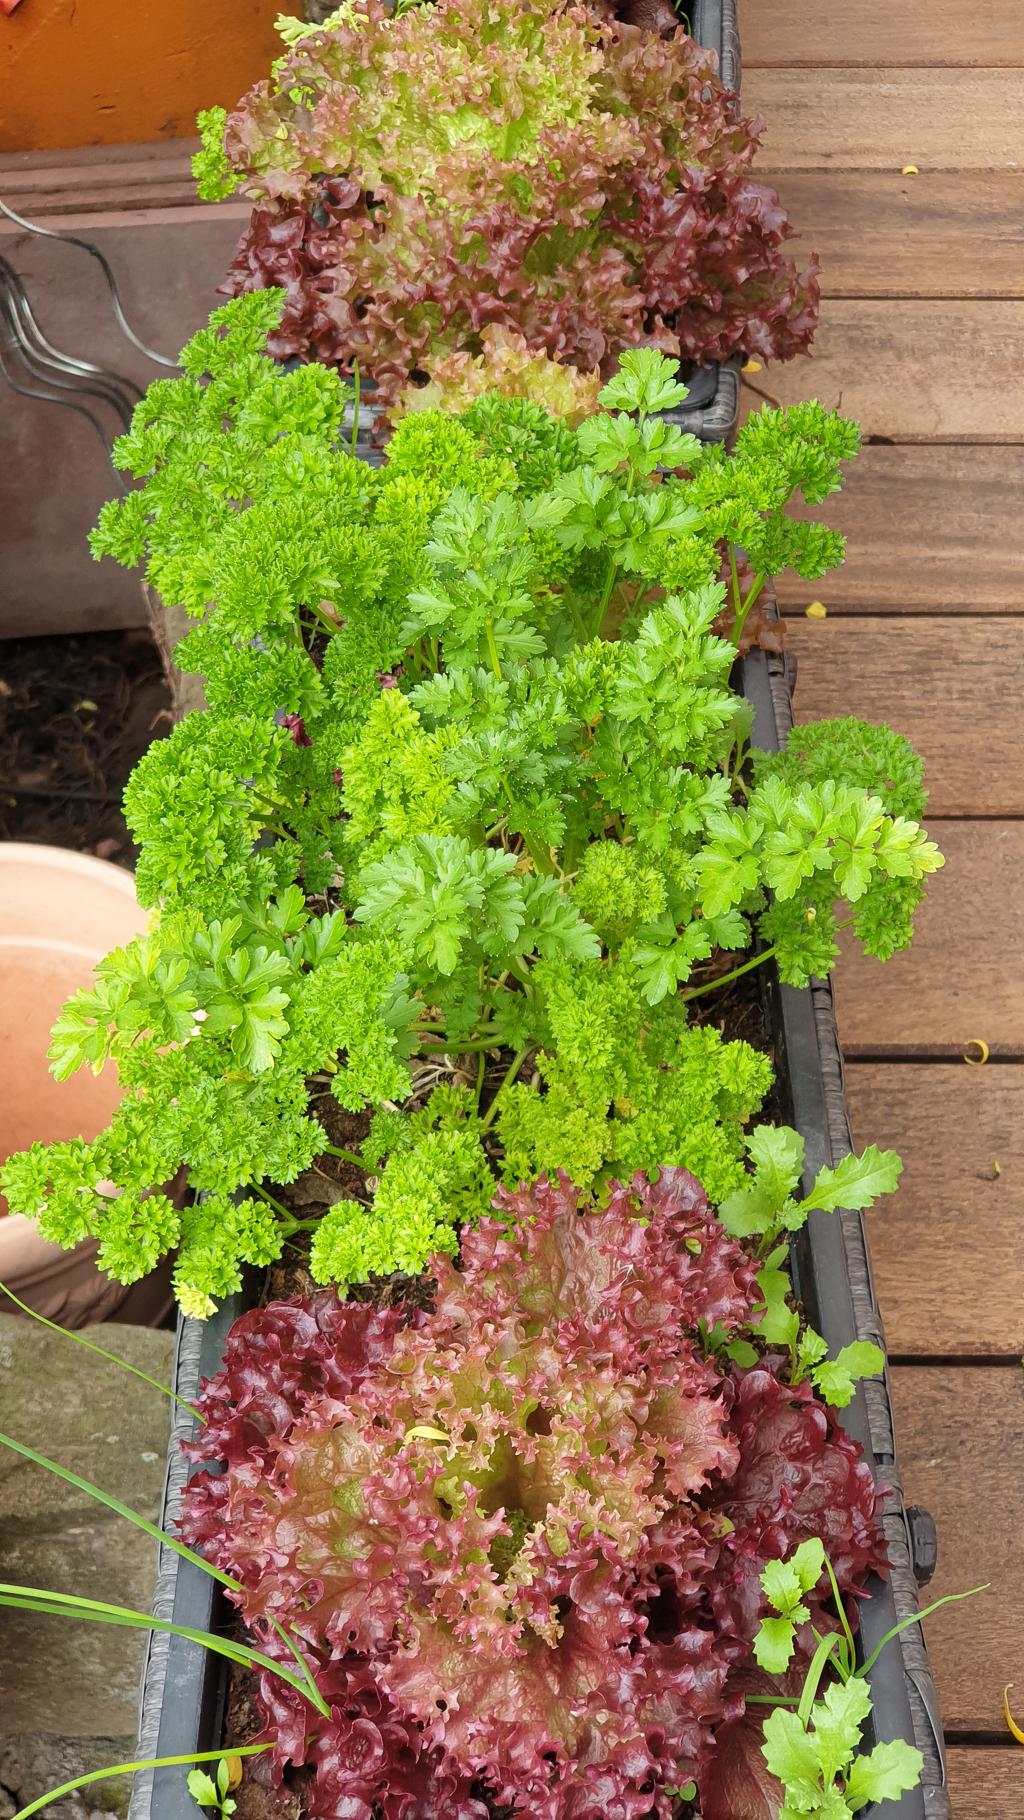 Salat im Blumenkasten